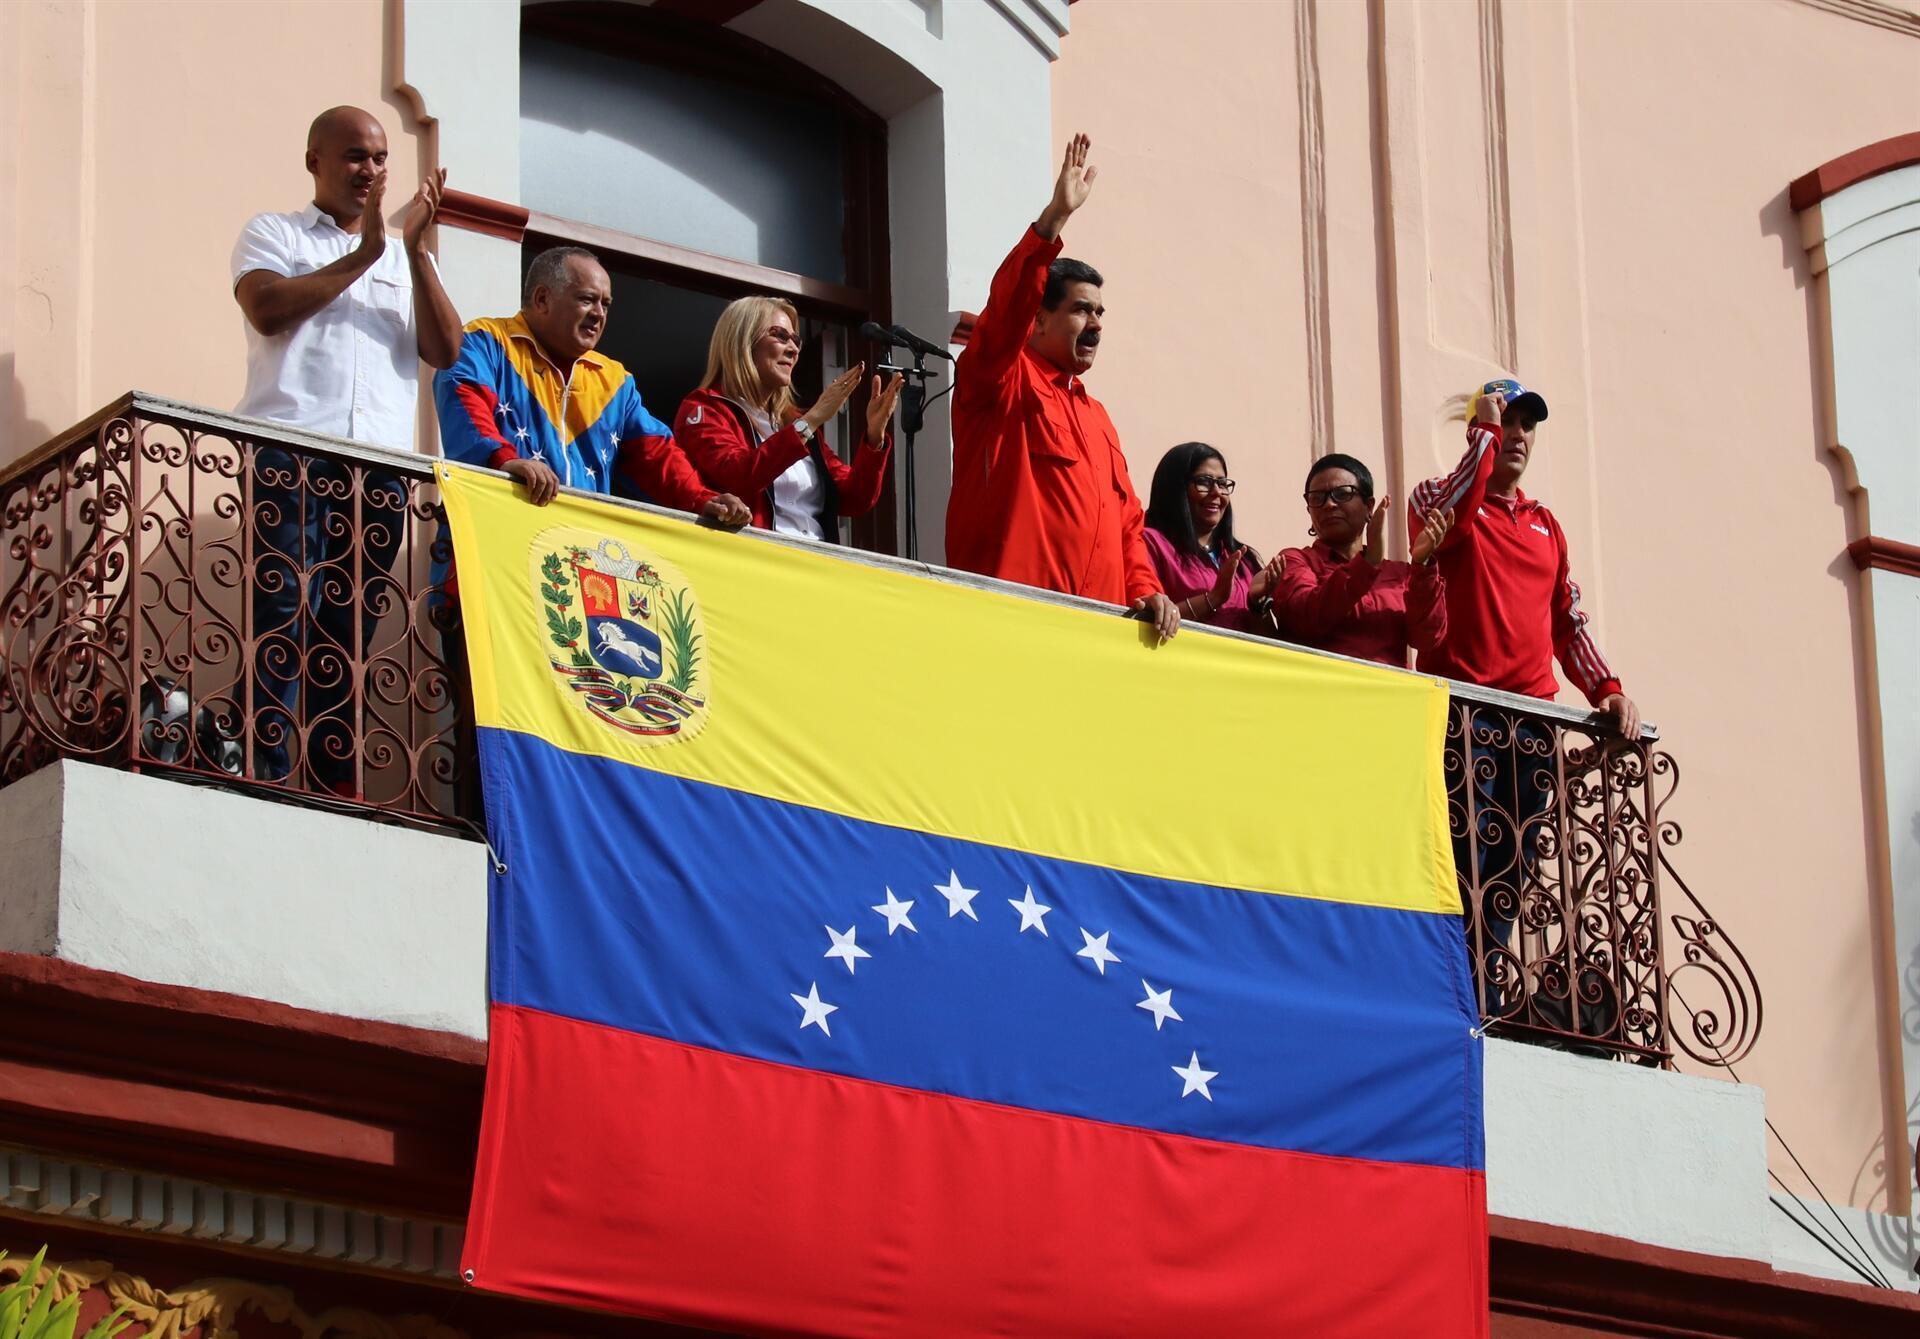 Maduro brother, stand tall, Erdoğan tells Venezuelan president after US move